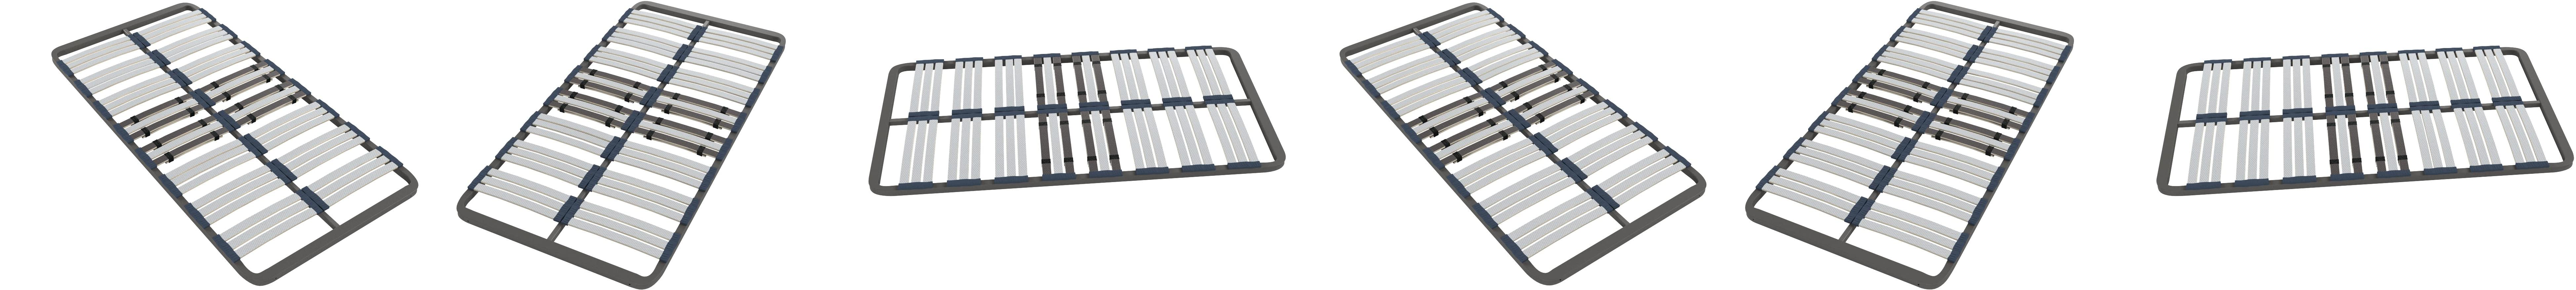 HOGAR24 Somier Multiláminas con Reguladores Lumbares, Sin Patas, Acero, 90x180cm